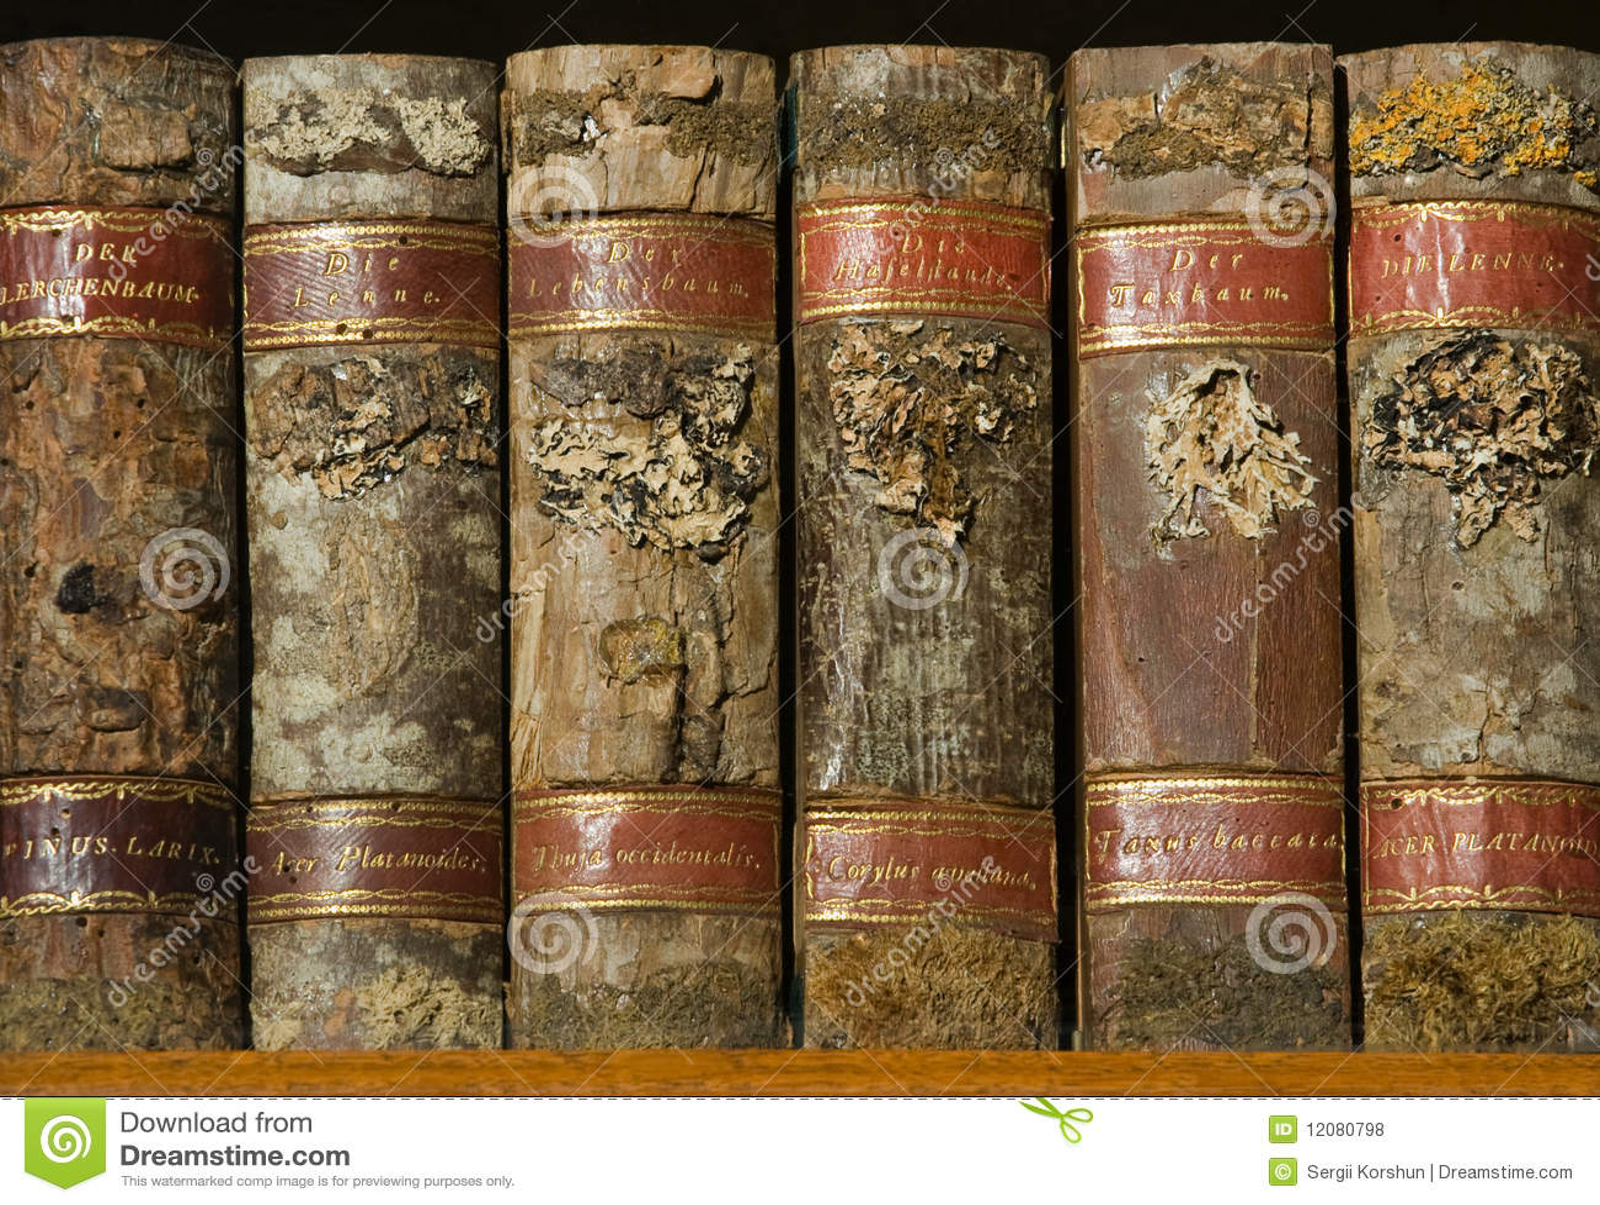 Xylotheca wooden books at the shelf stock photo - image: 120.